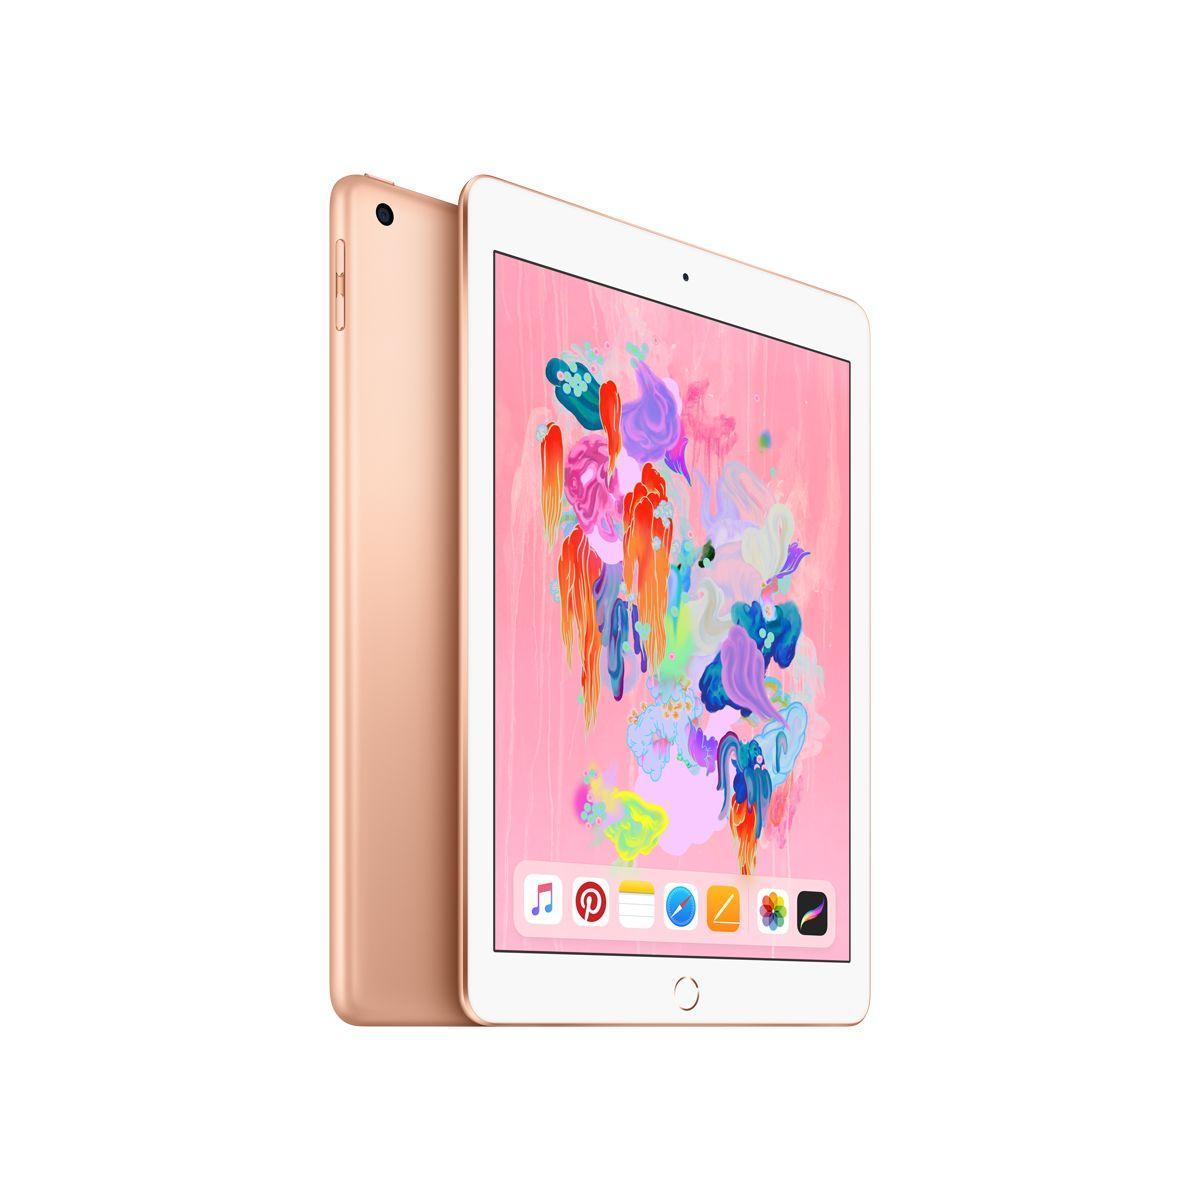 Tablette apple ipad new 32go or (photo)